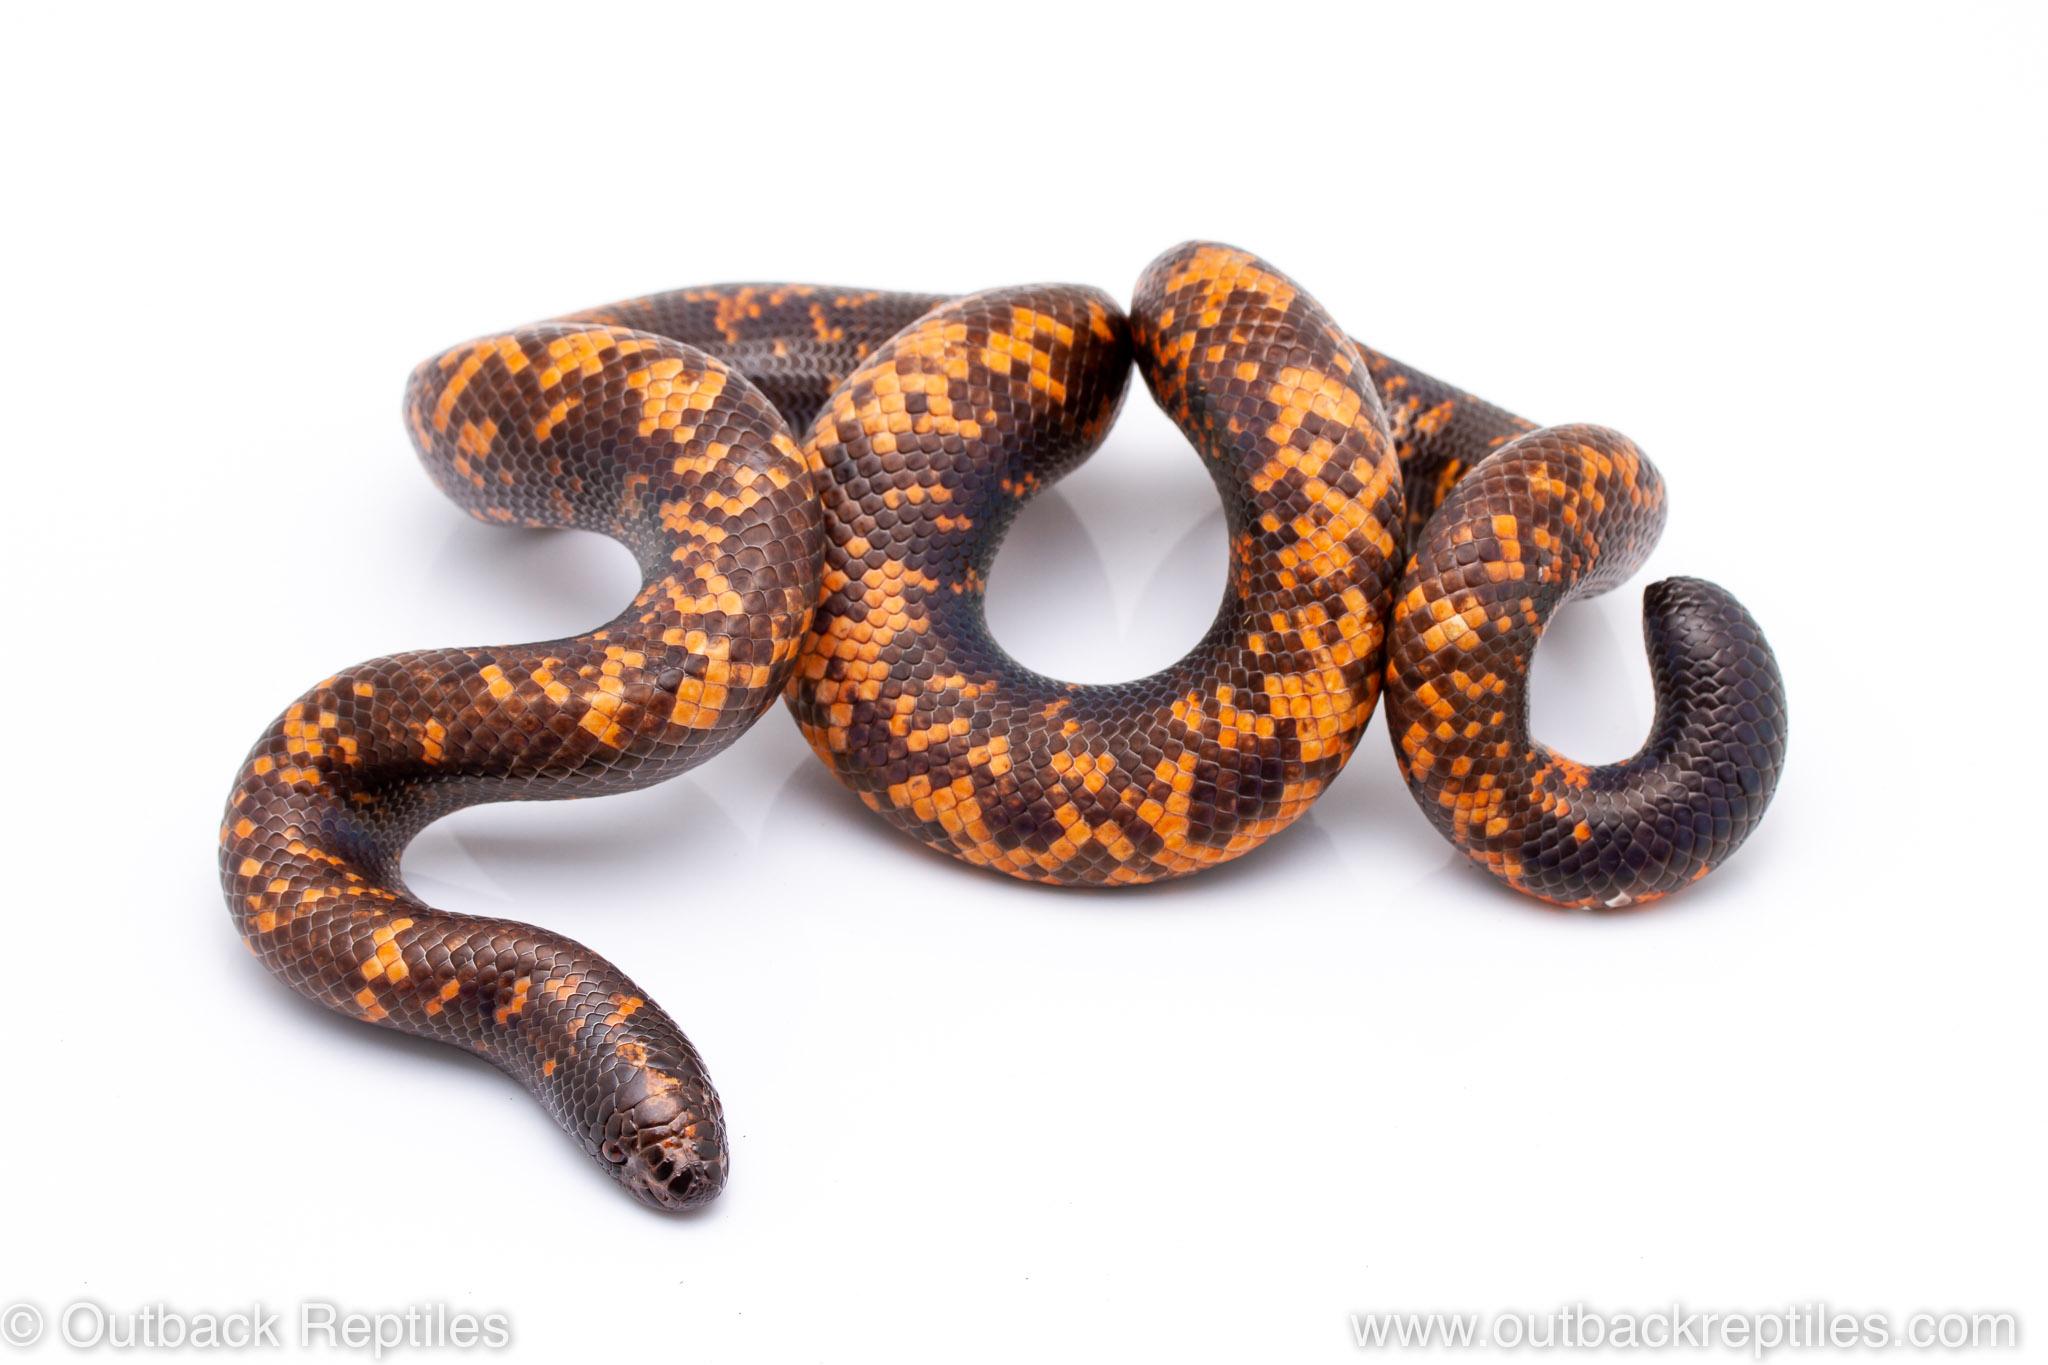 calabar python for sale